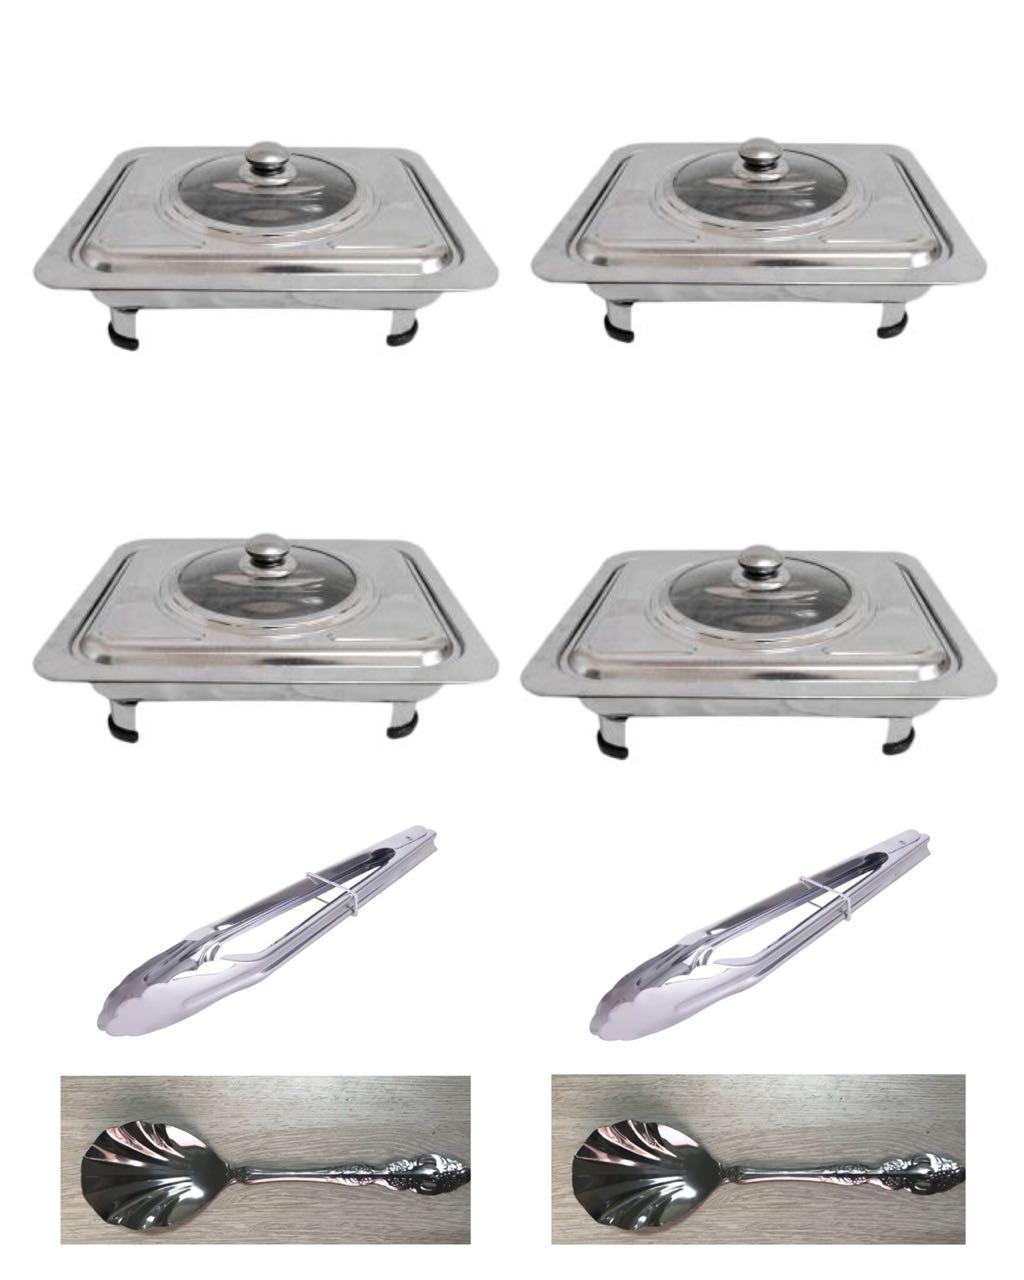 555 Wadah Saji Masakan - Prasmanan Set Isi 4 + Sendok Sayur 2 Pcs + Jepitan Makanan 2 Pcs By Maxi Store.